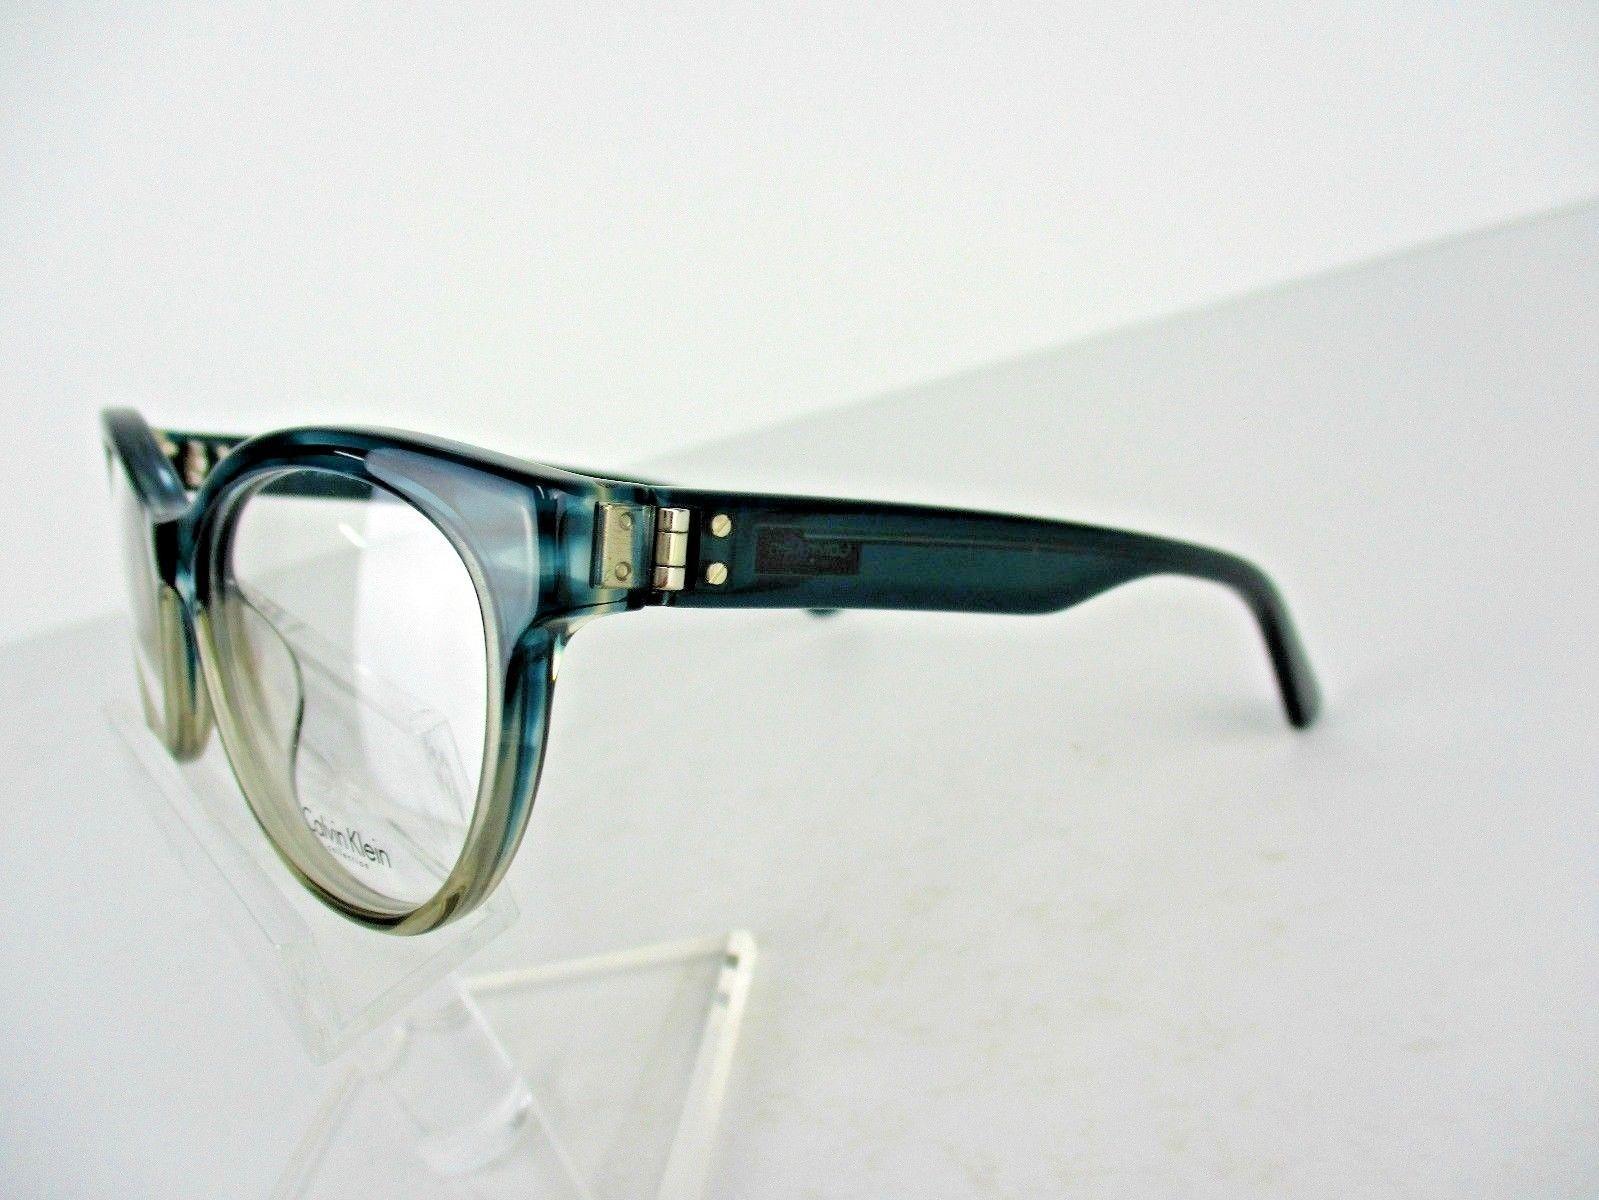 Calvin Klein CK 7986 (408) Teal/Taupe Horn 53 X 17 135 mm Eyeglass Frame